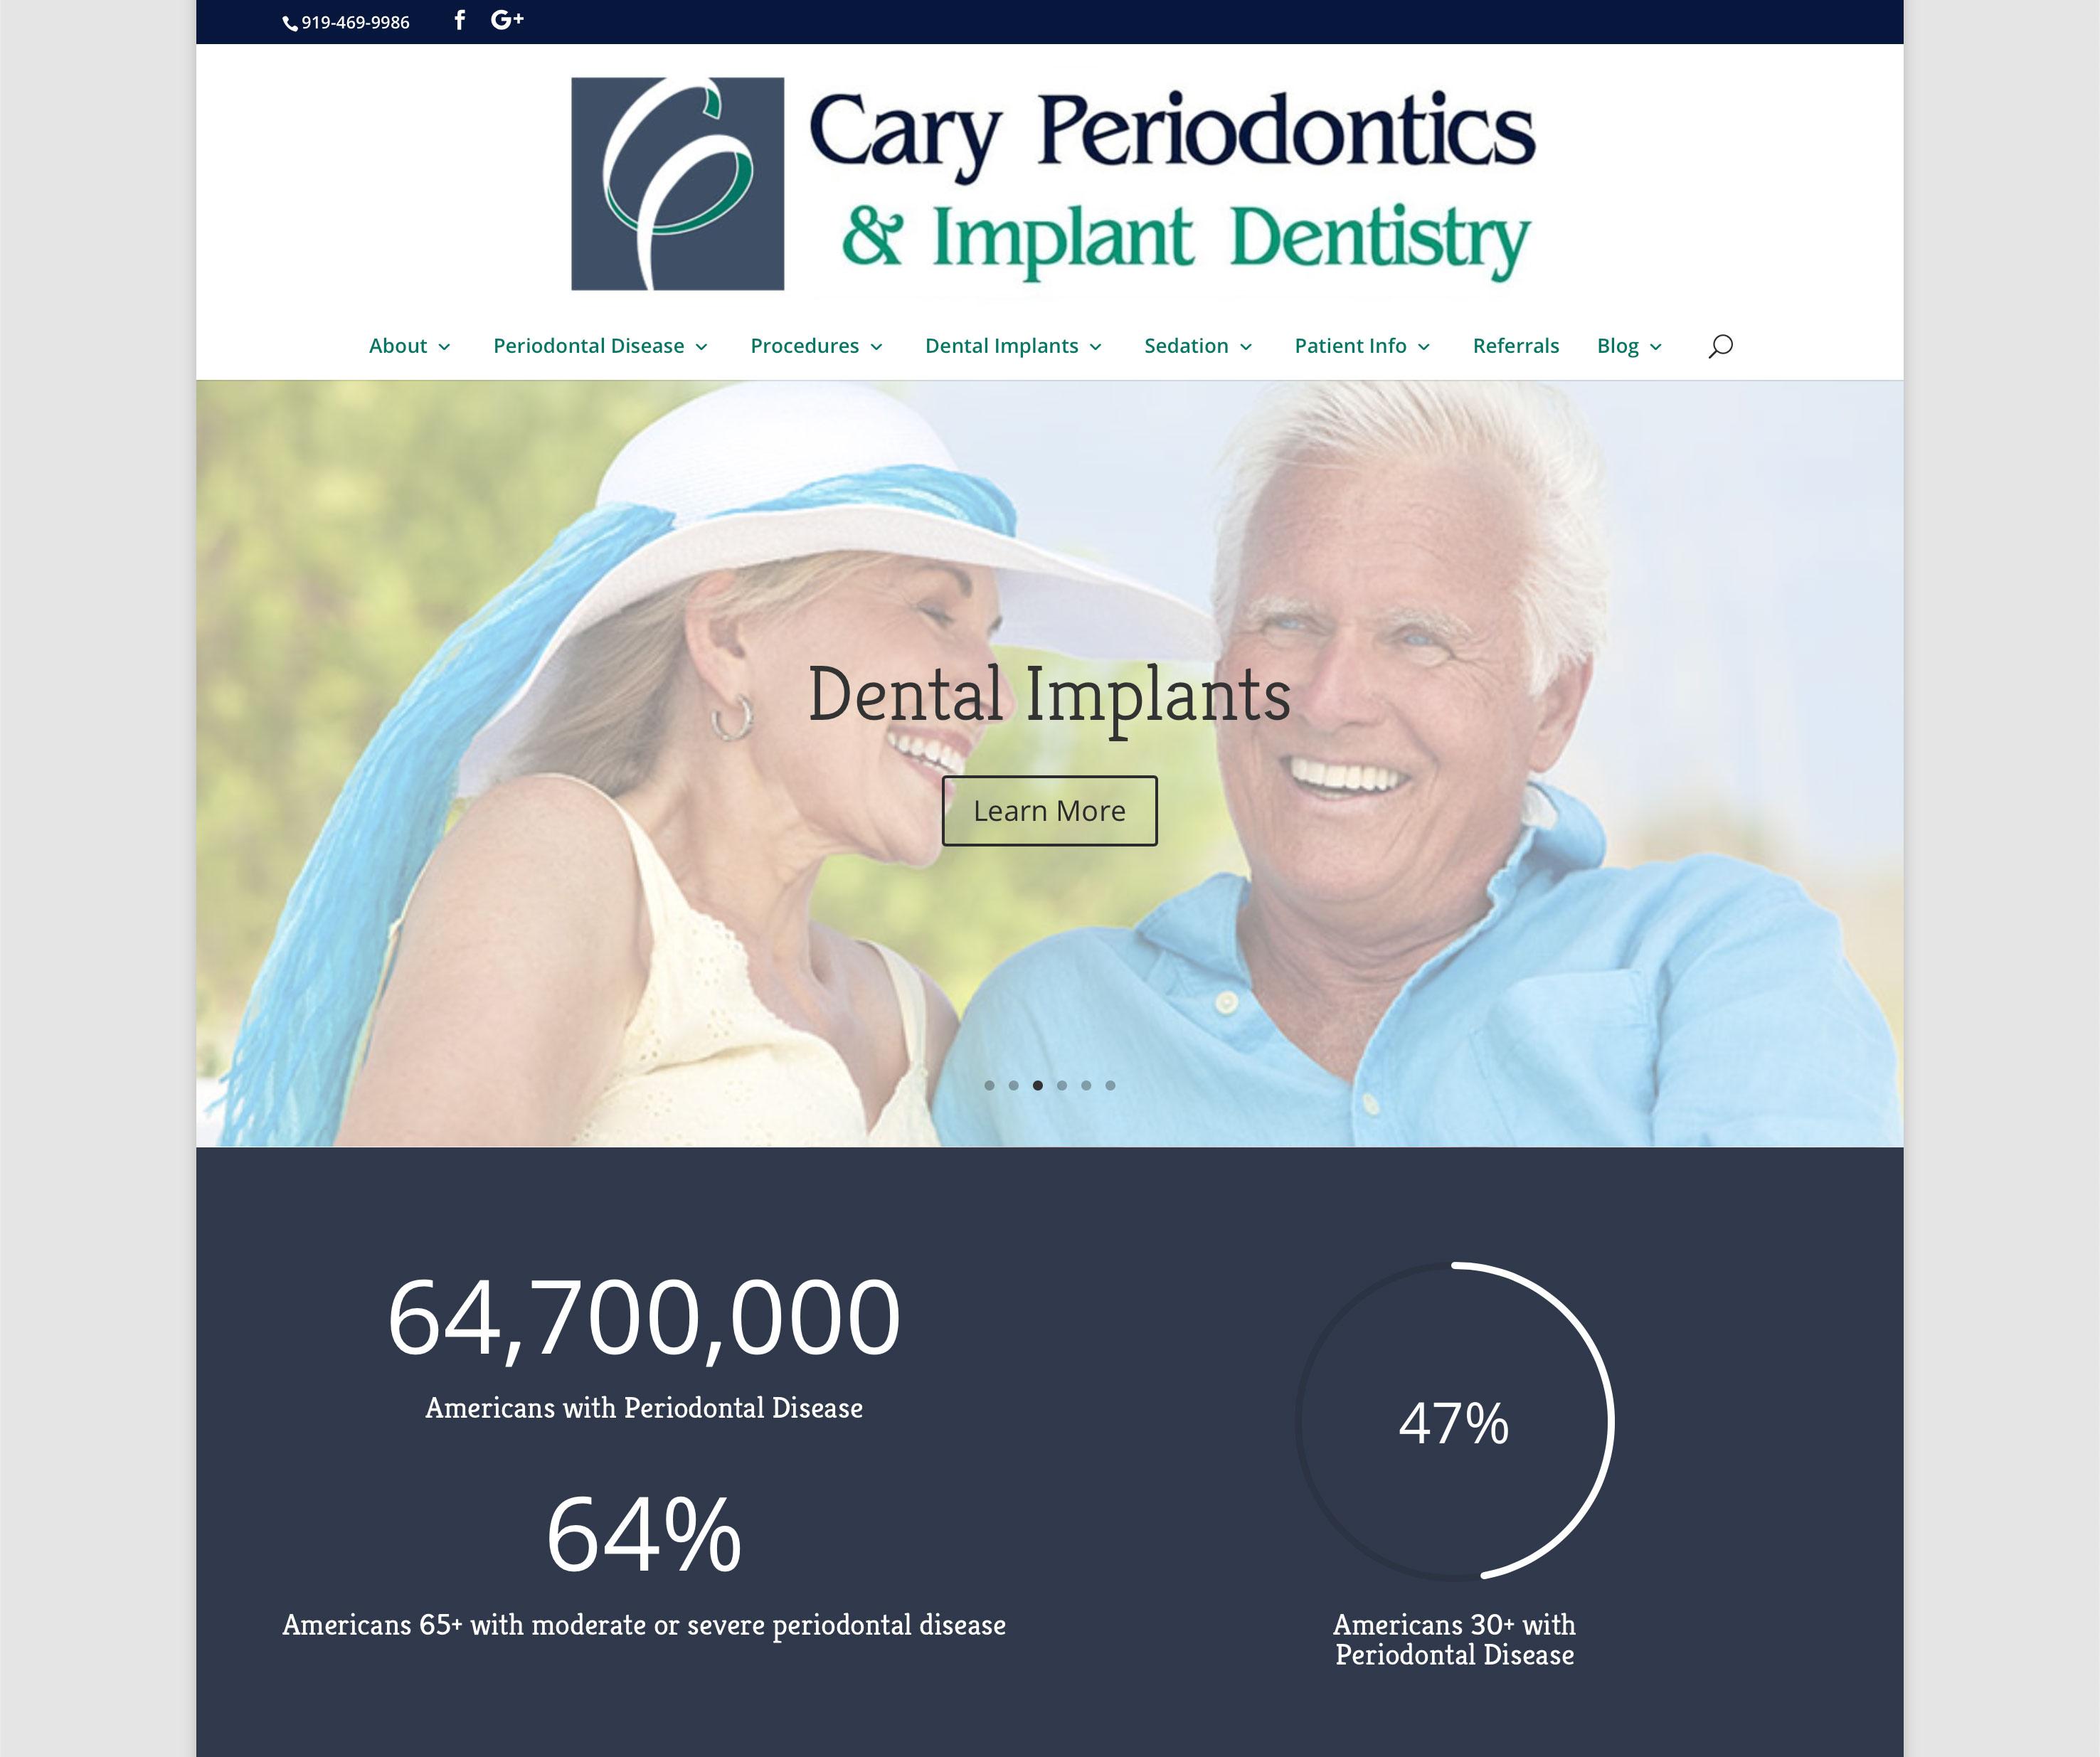 Cary Periodontics website homepage